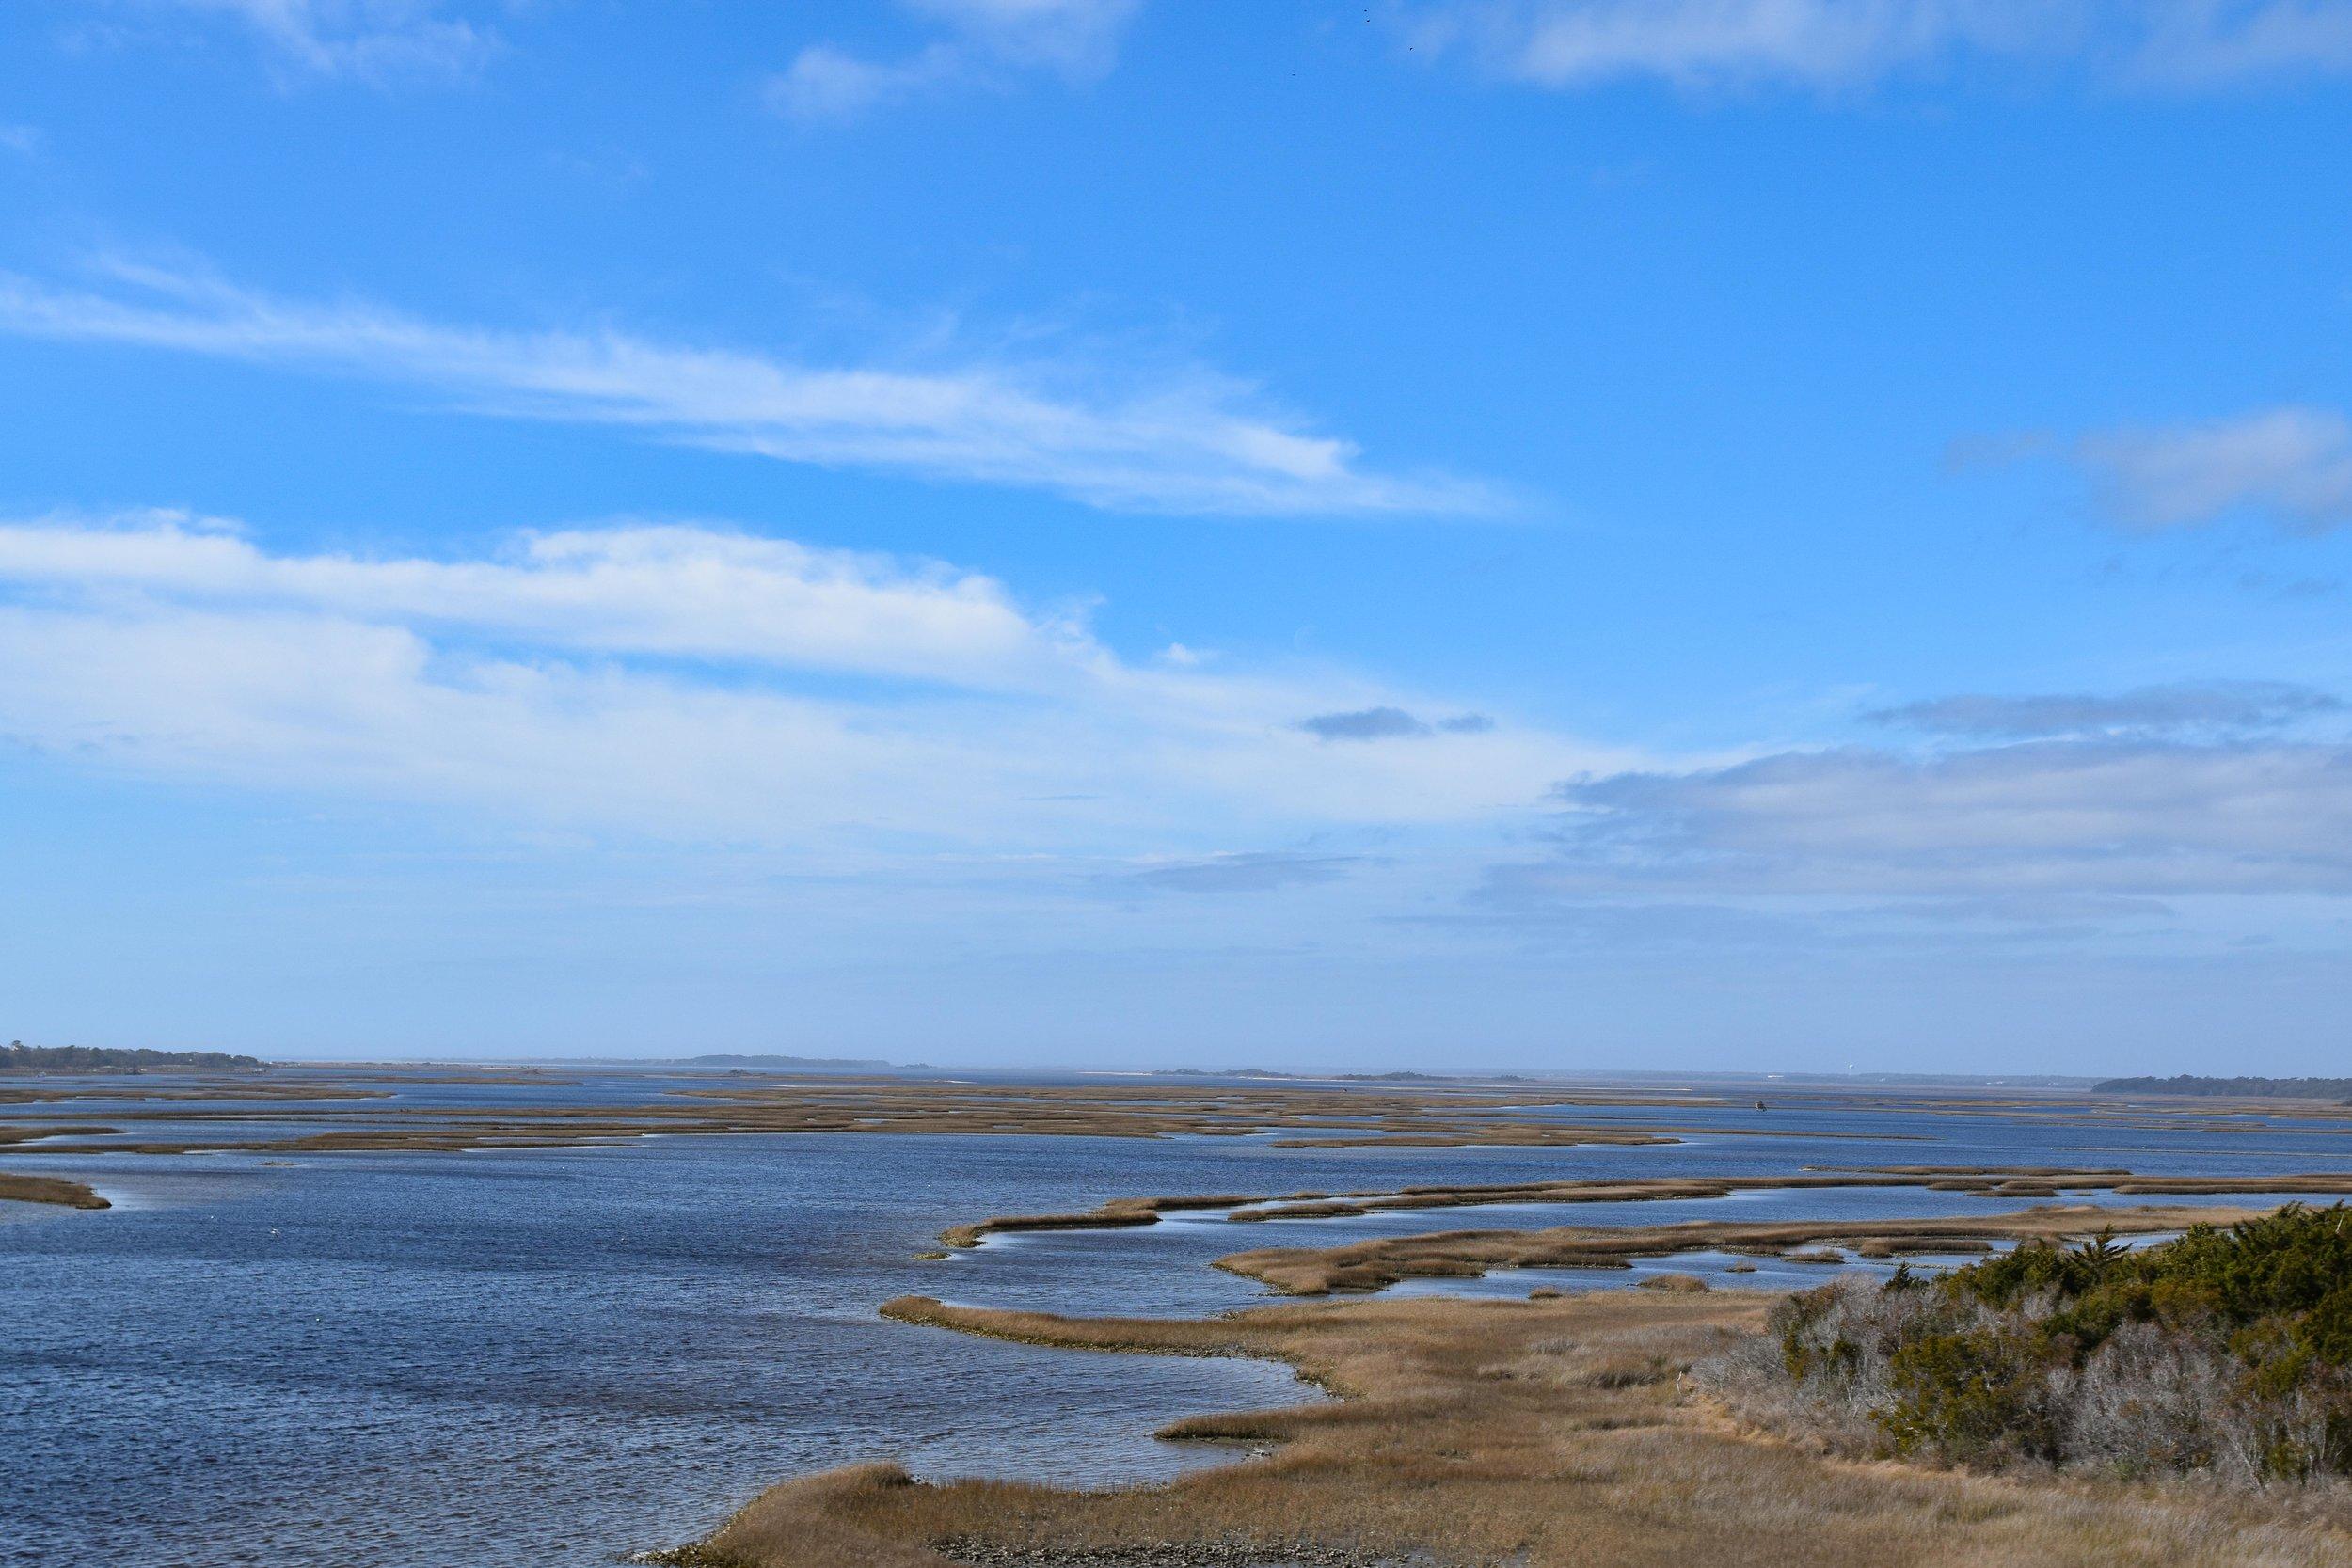 Tidewater, Outer Banks, North Carolina